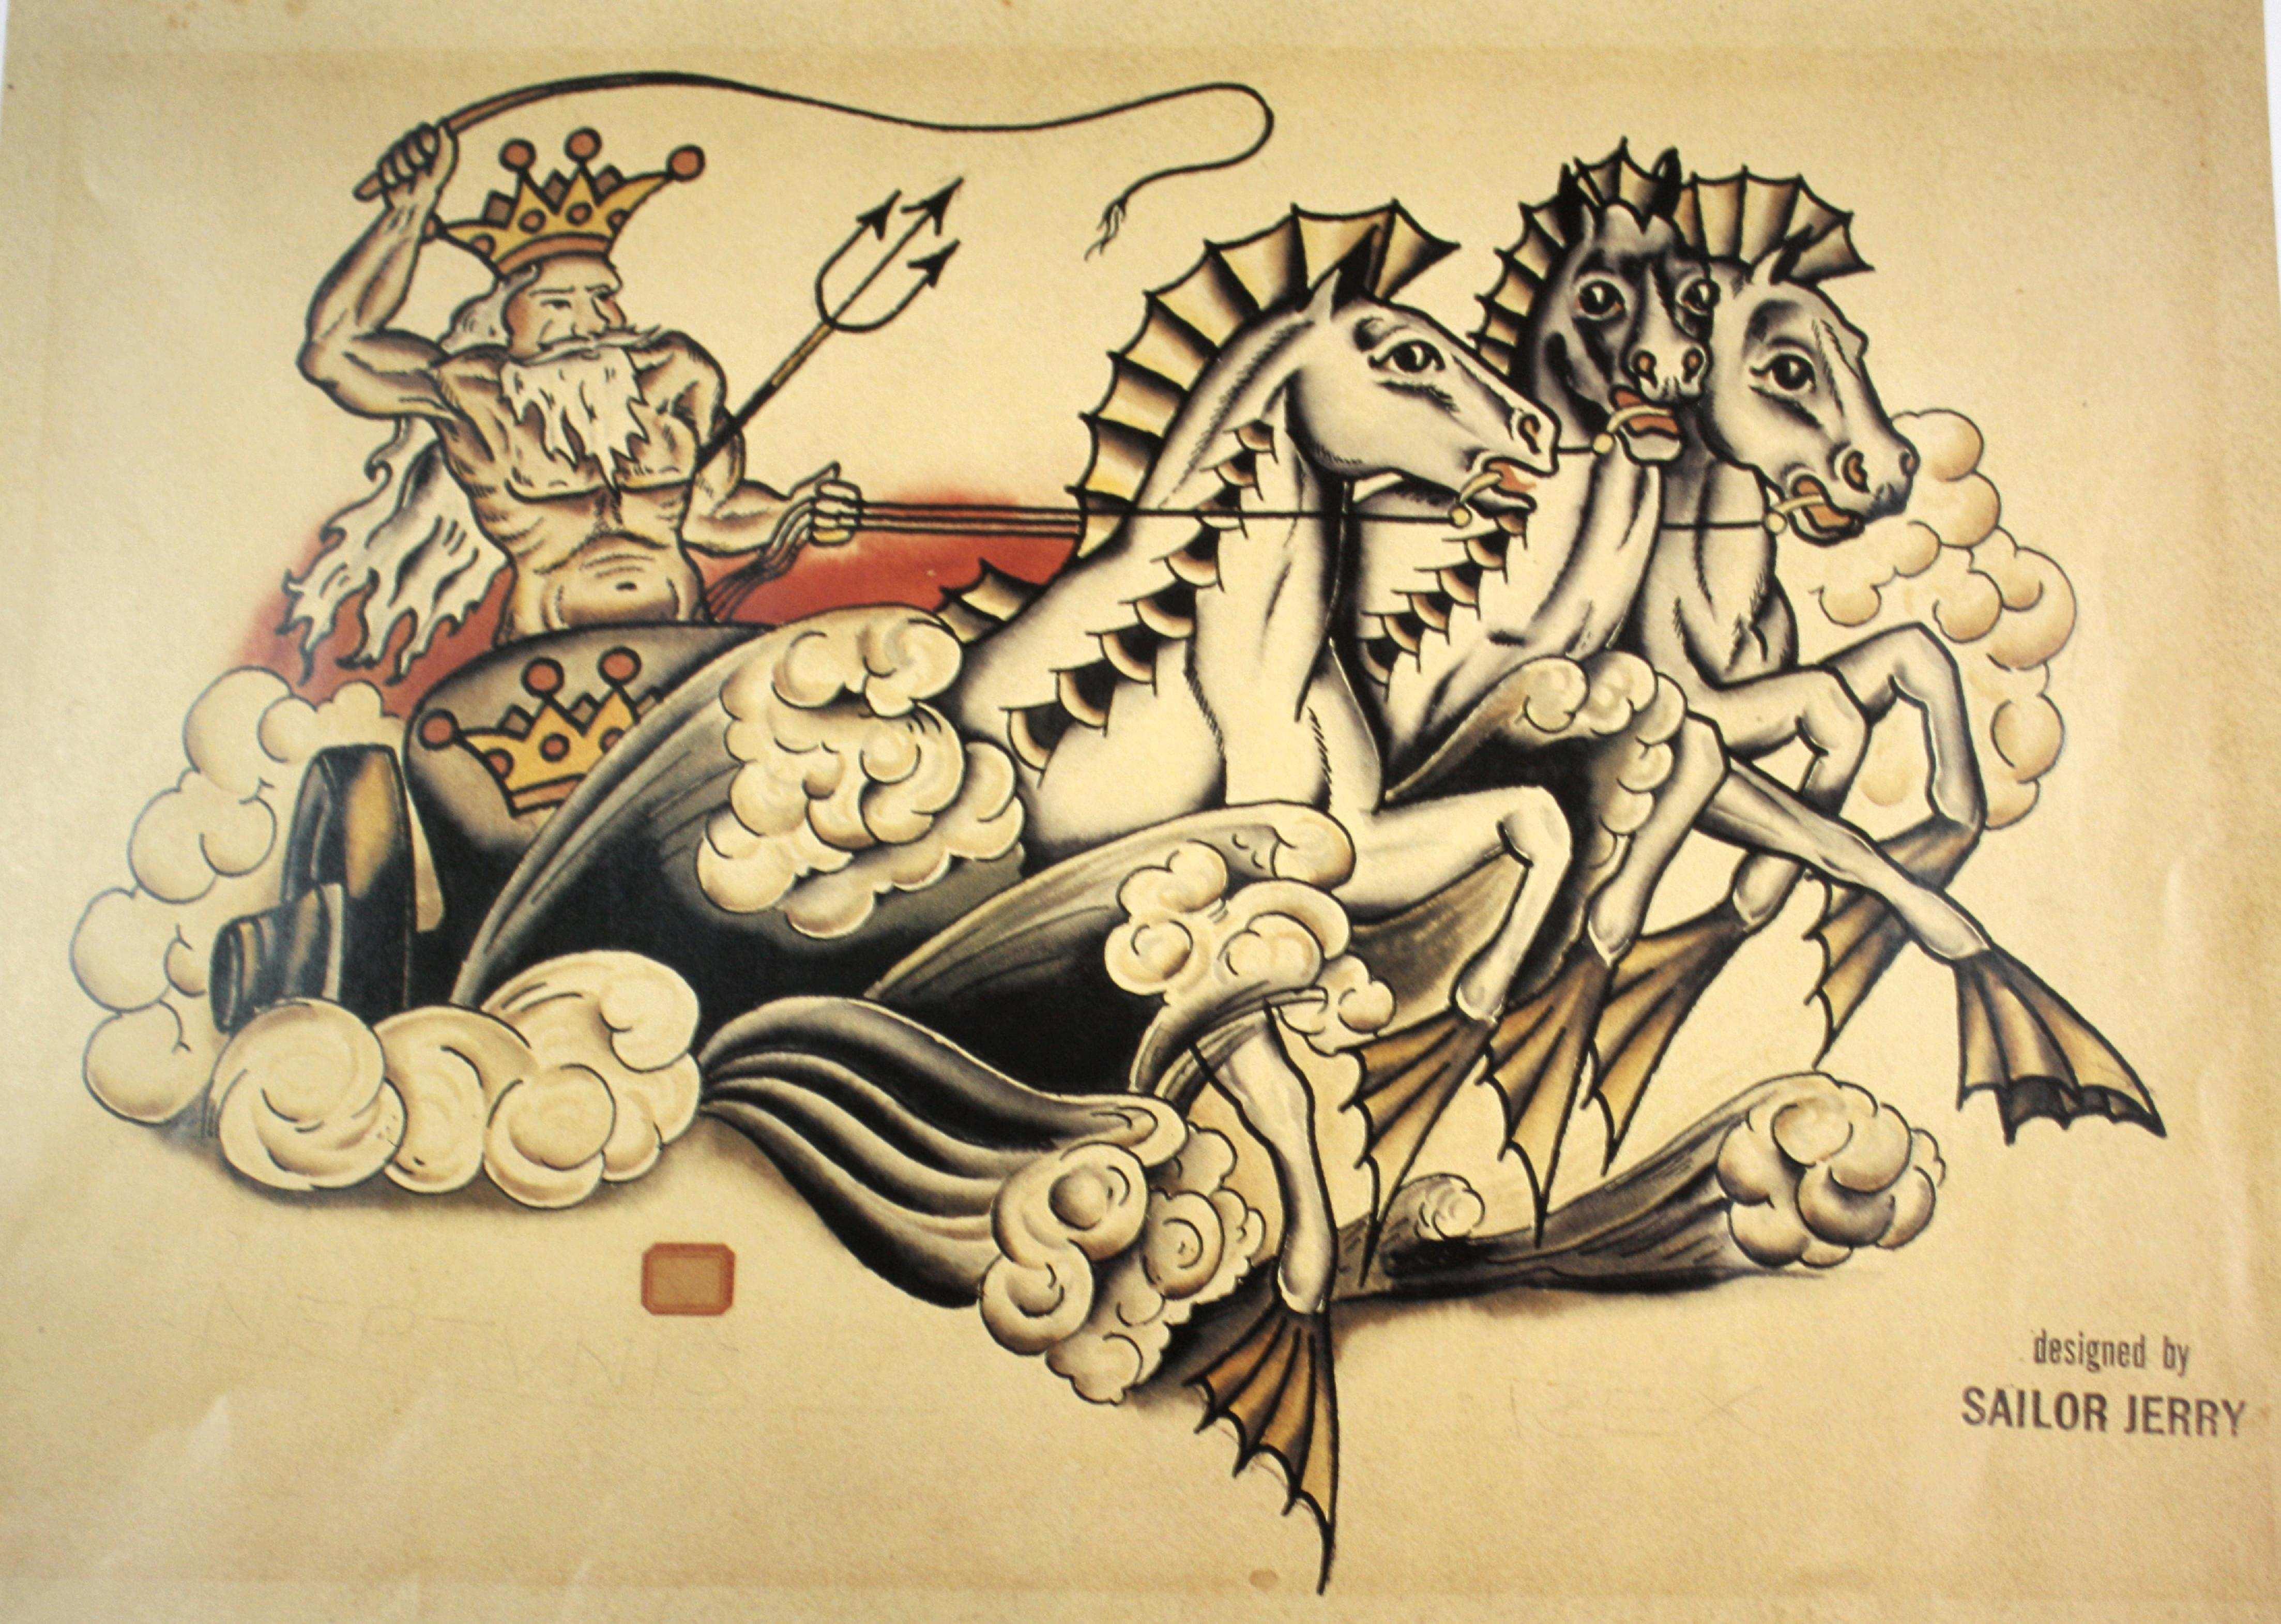 Sailor Jerry Collins Norman Collins Sailor Jerry Tattoo Flash Vol 1 Avaxhome